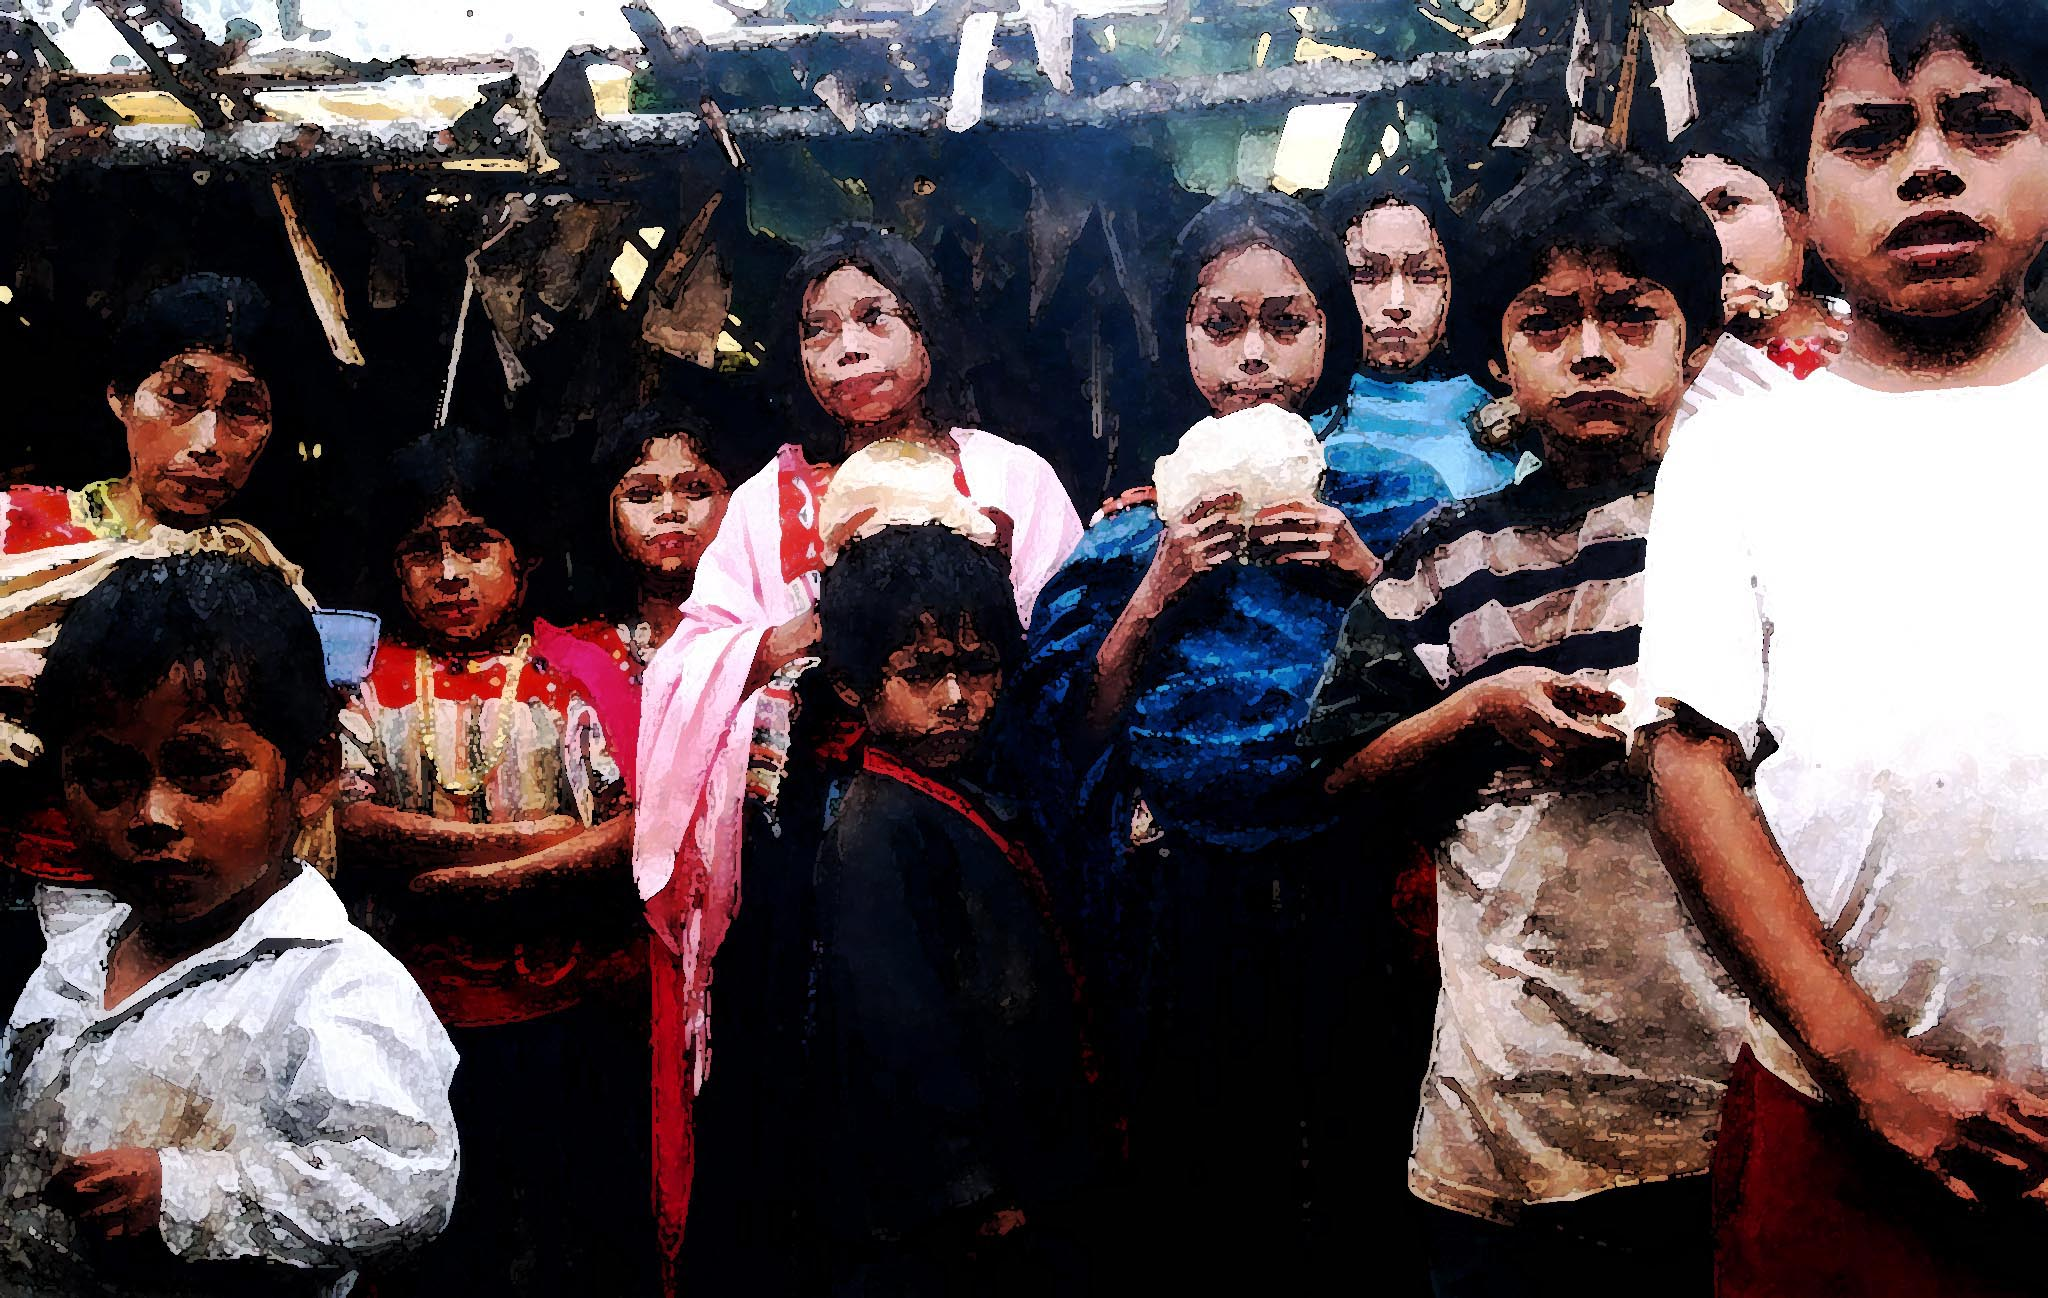 Desplazados en Xoyep, 1997